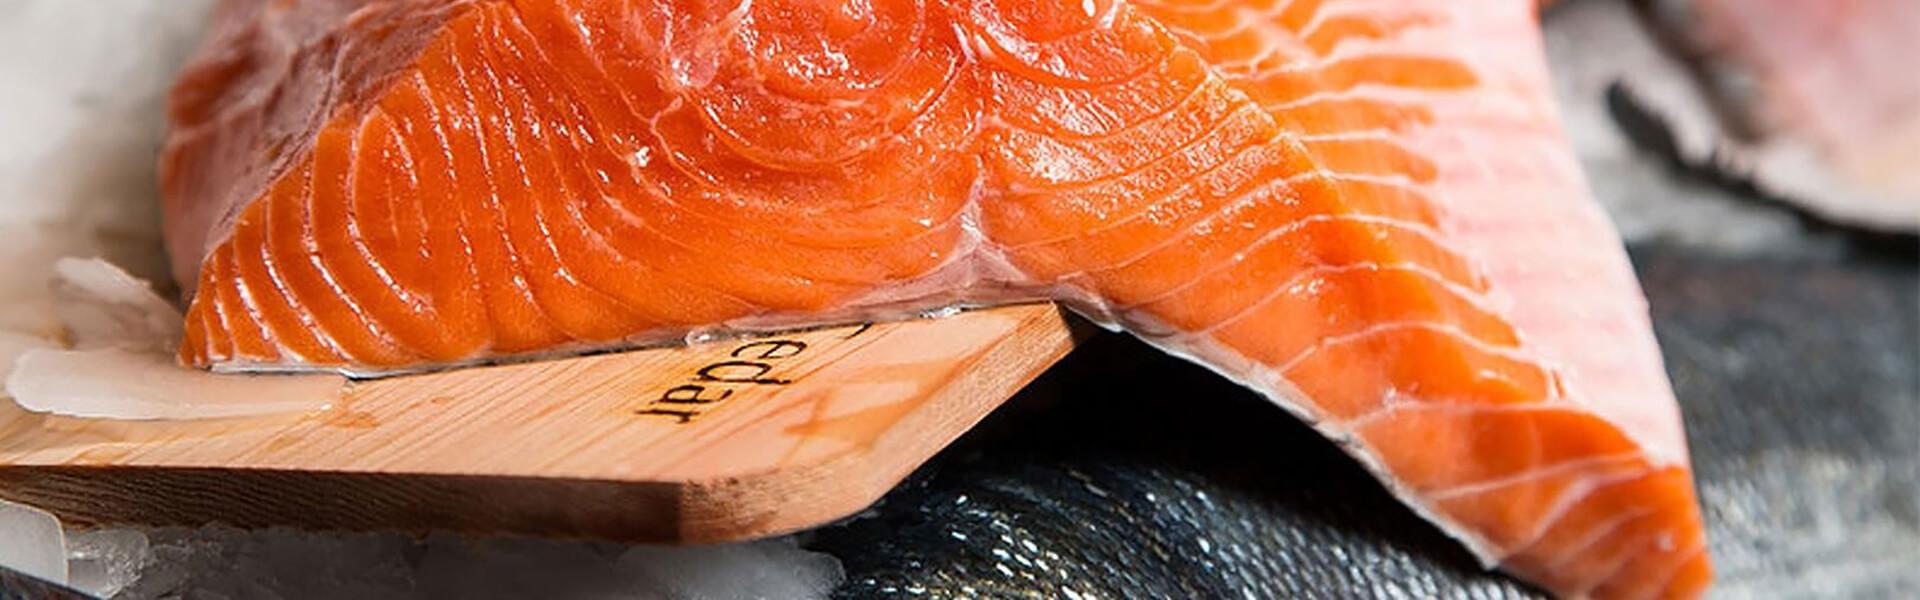 Seafood Process Equipment